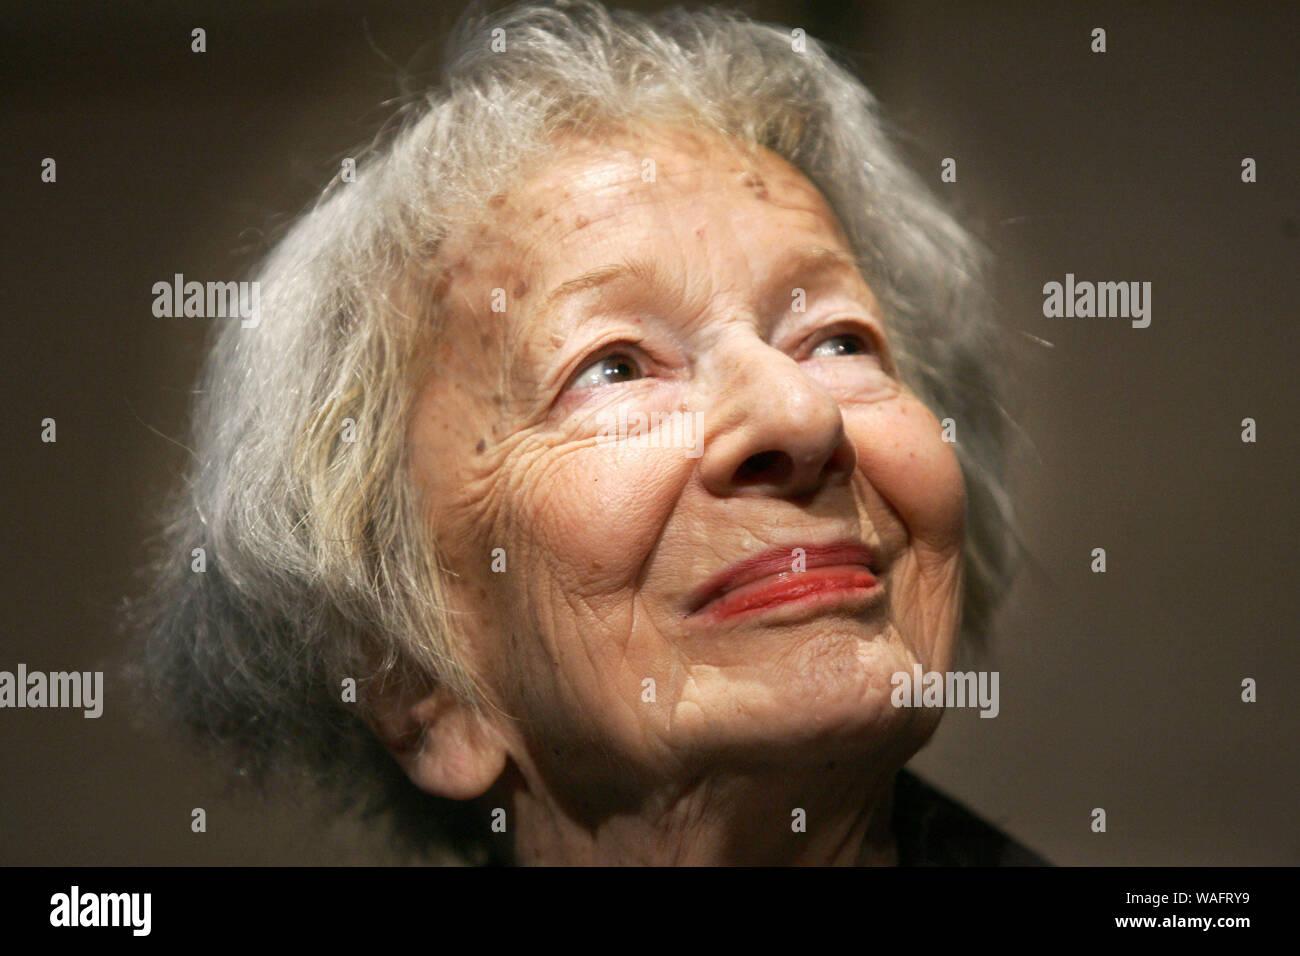 Wislawa Szymborska Imágenes De Stock Wislawa Szymborska